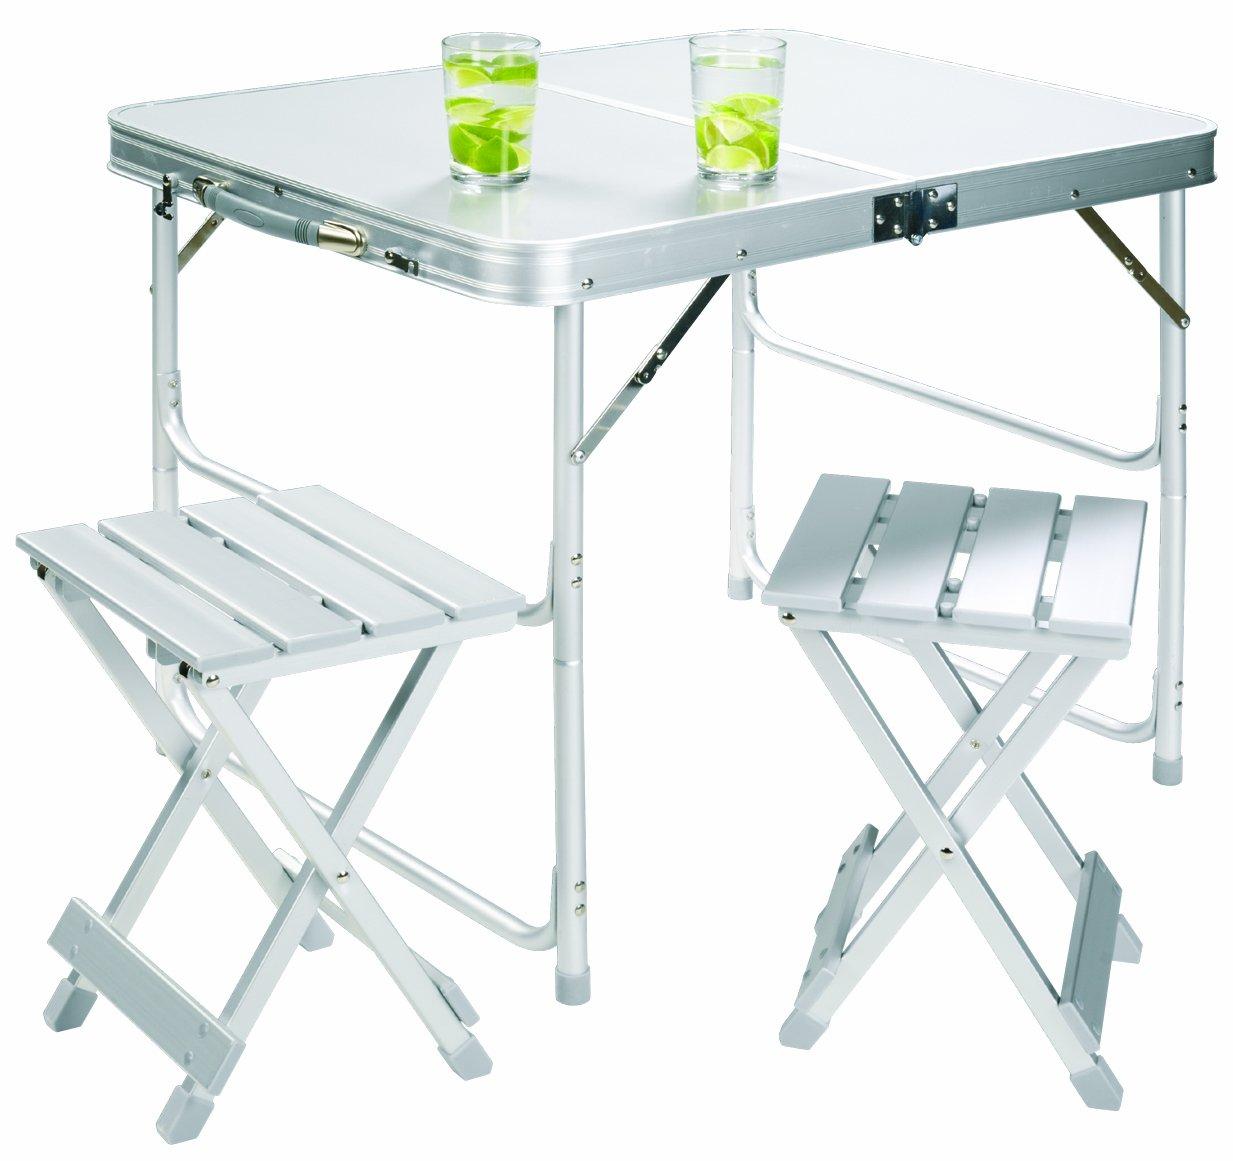 Grand Canyon Koffertisch Set inkl. 2 Hocker, klappbar, Aluminium, silber, 308006 günstig online kaufen